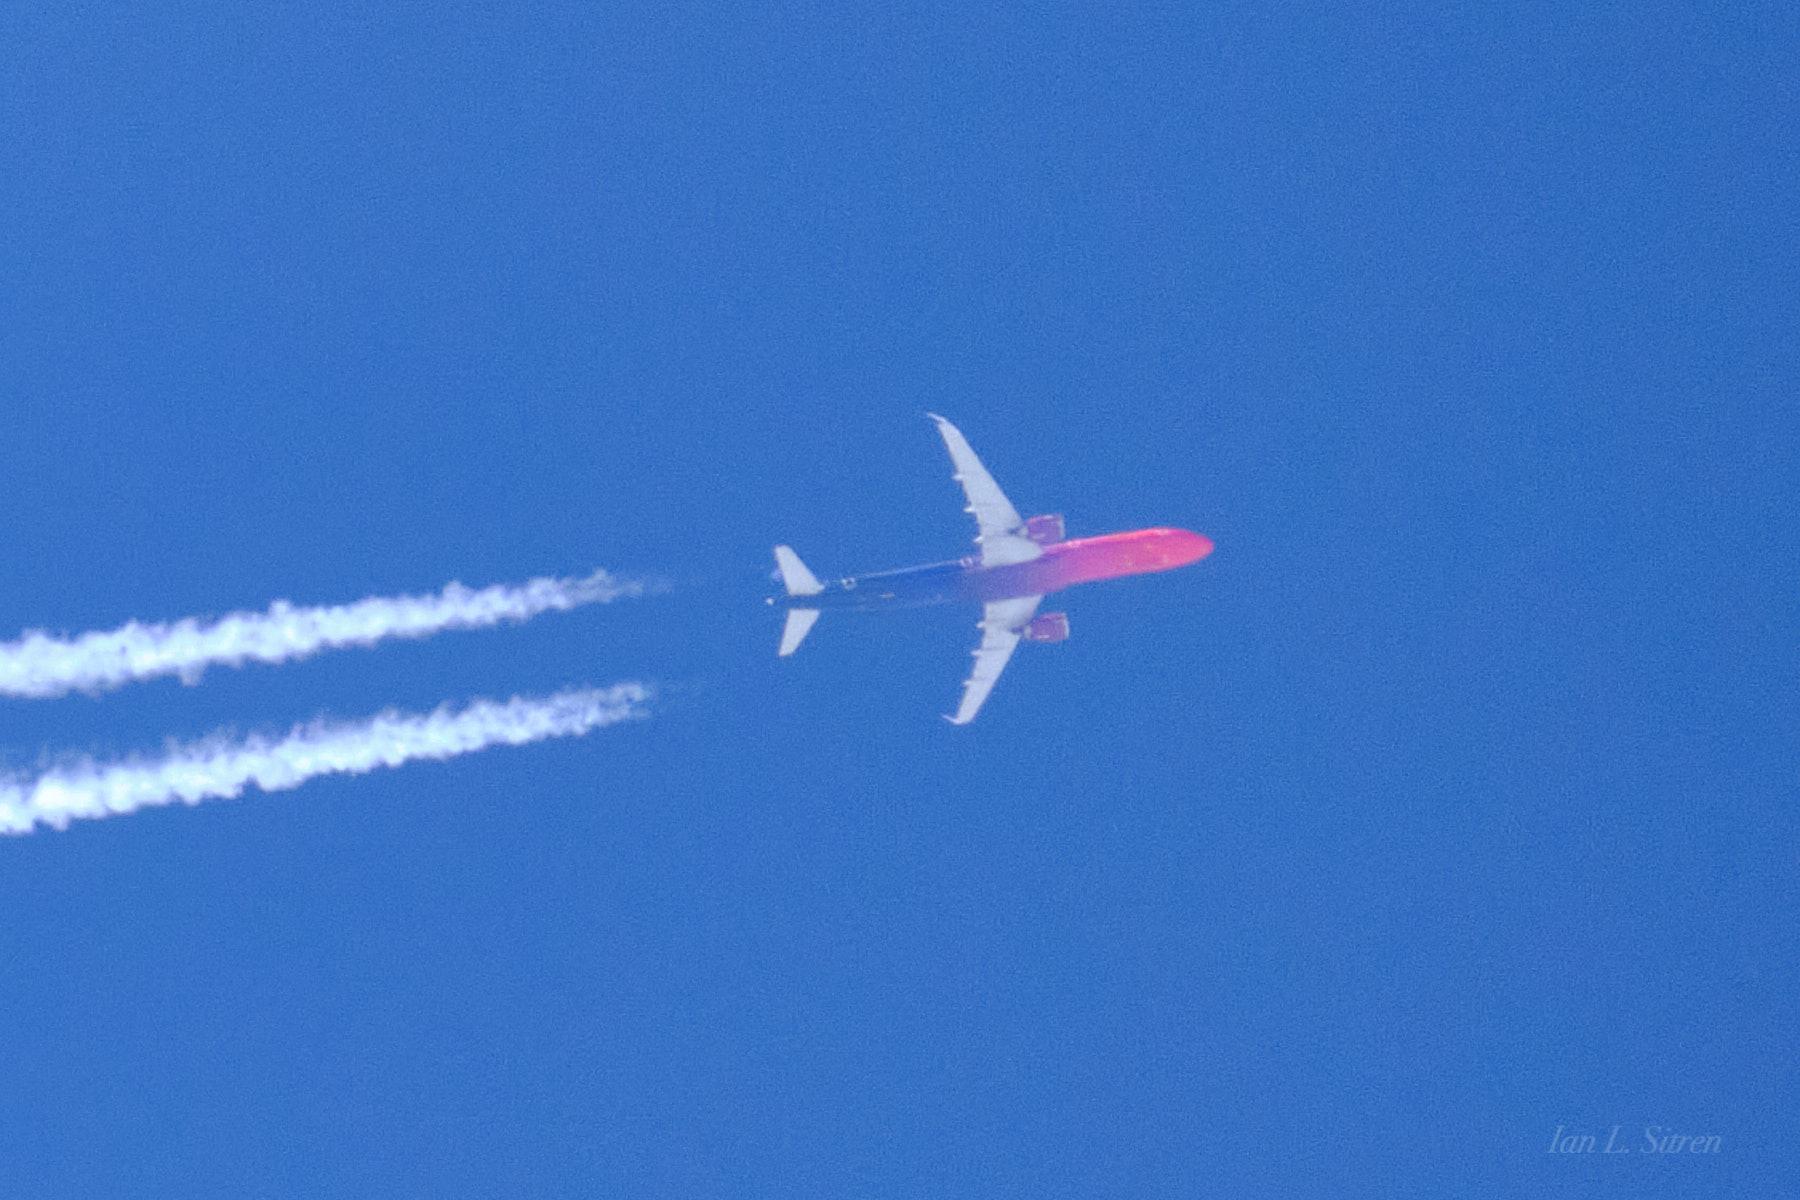 38,000 ft